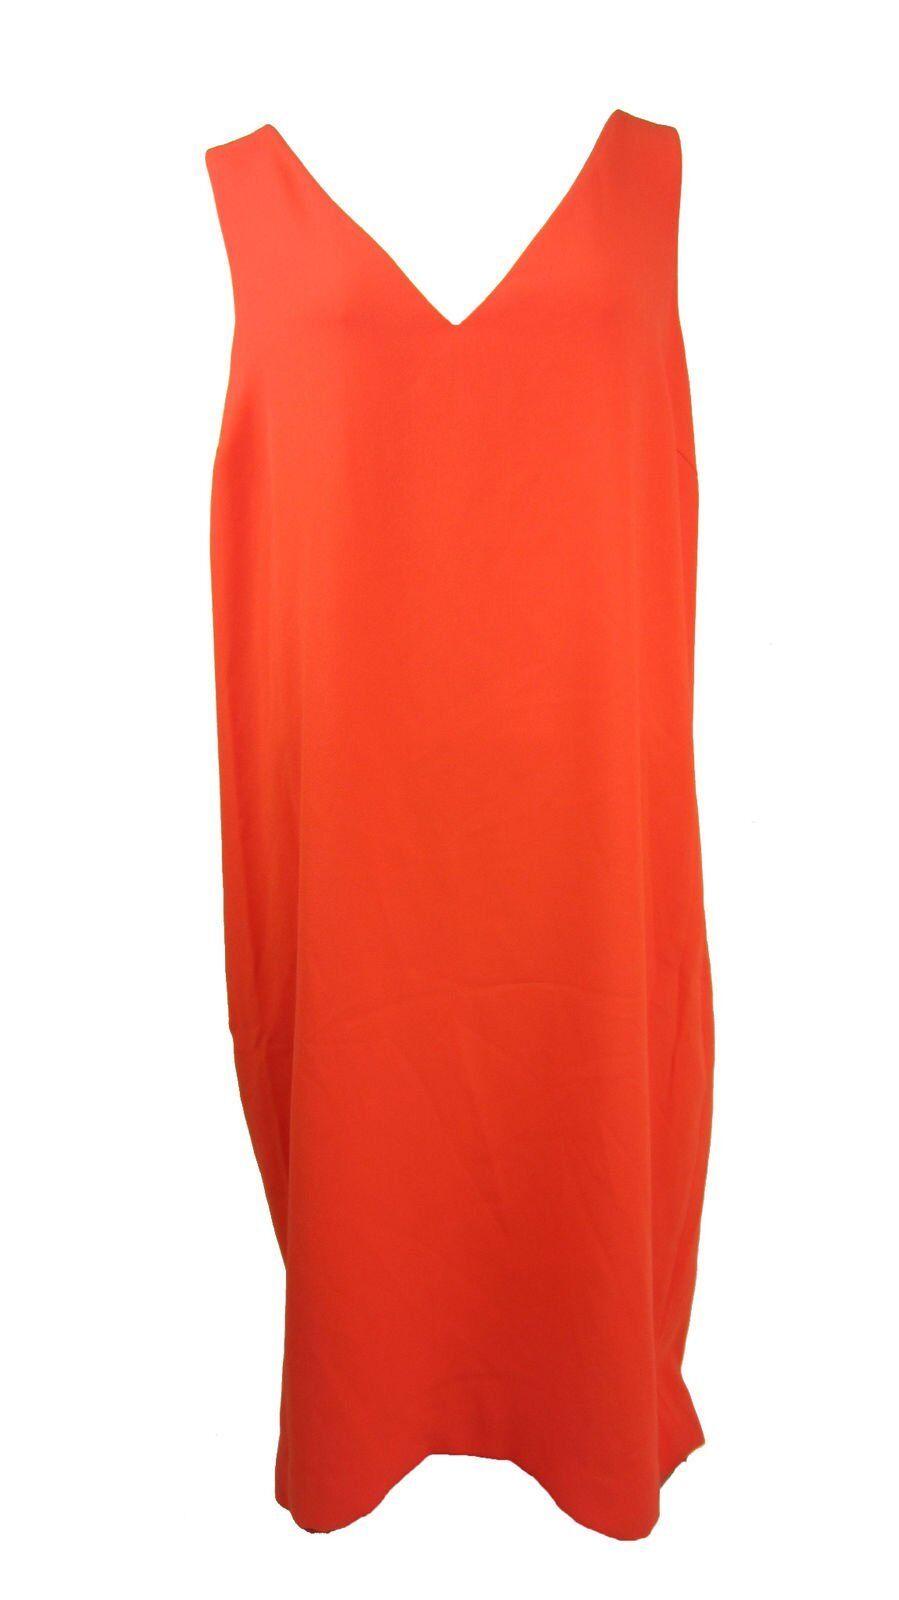 Ralph Lauren Crepe Sleeveless Shift Dress Vienna orange Size 16